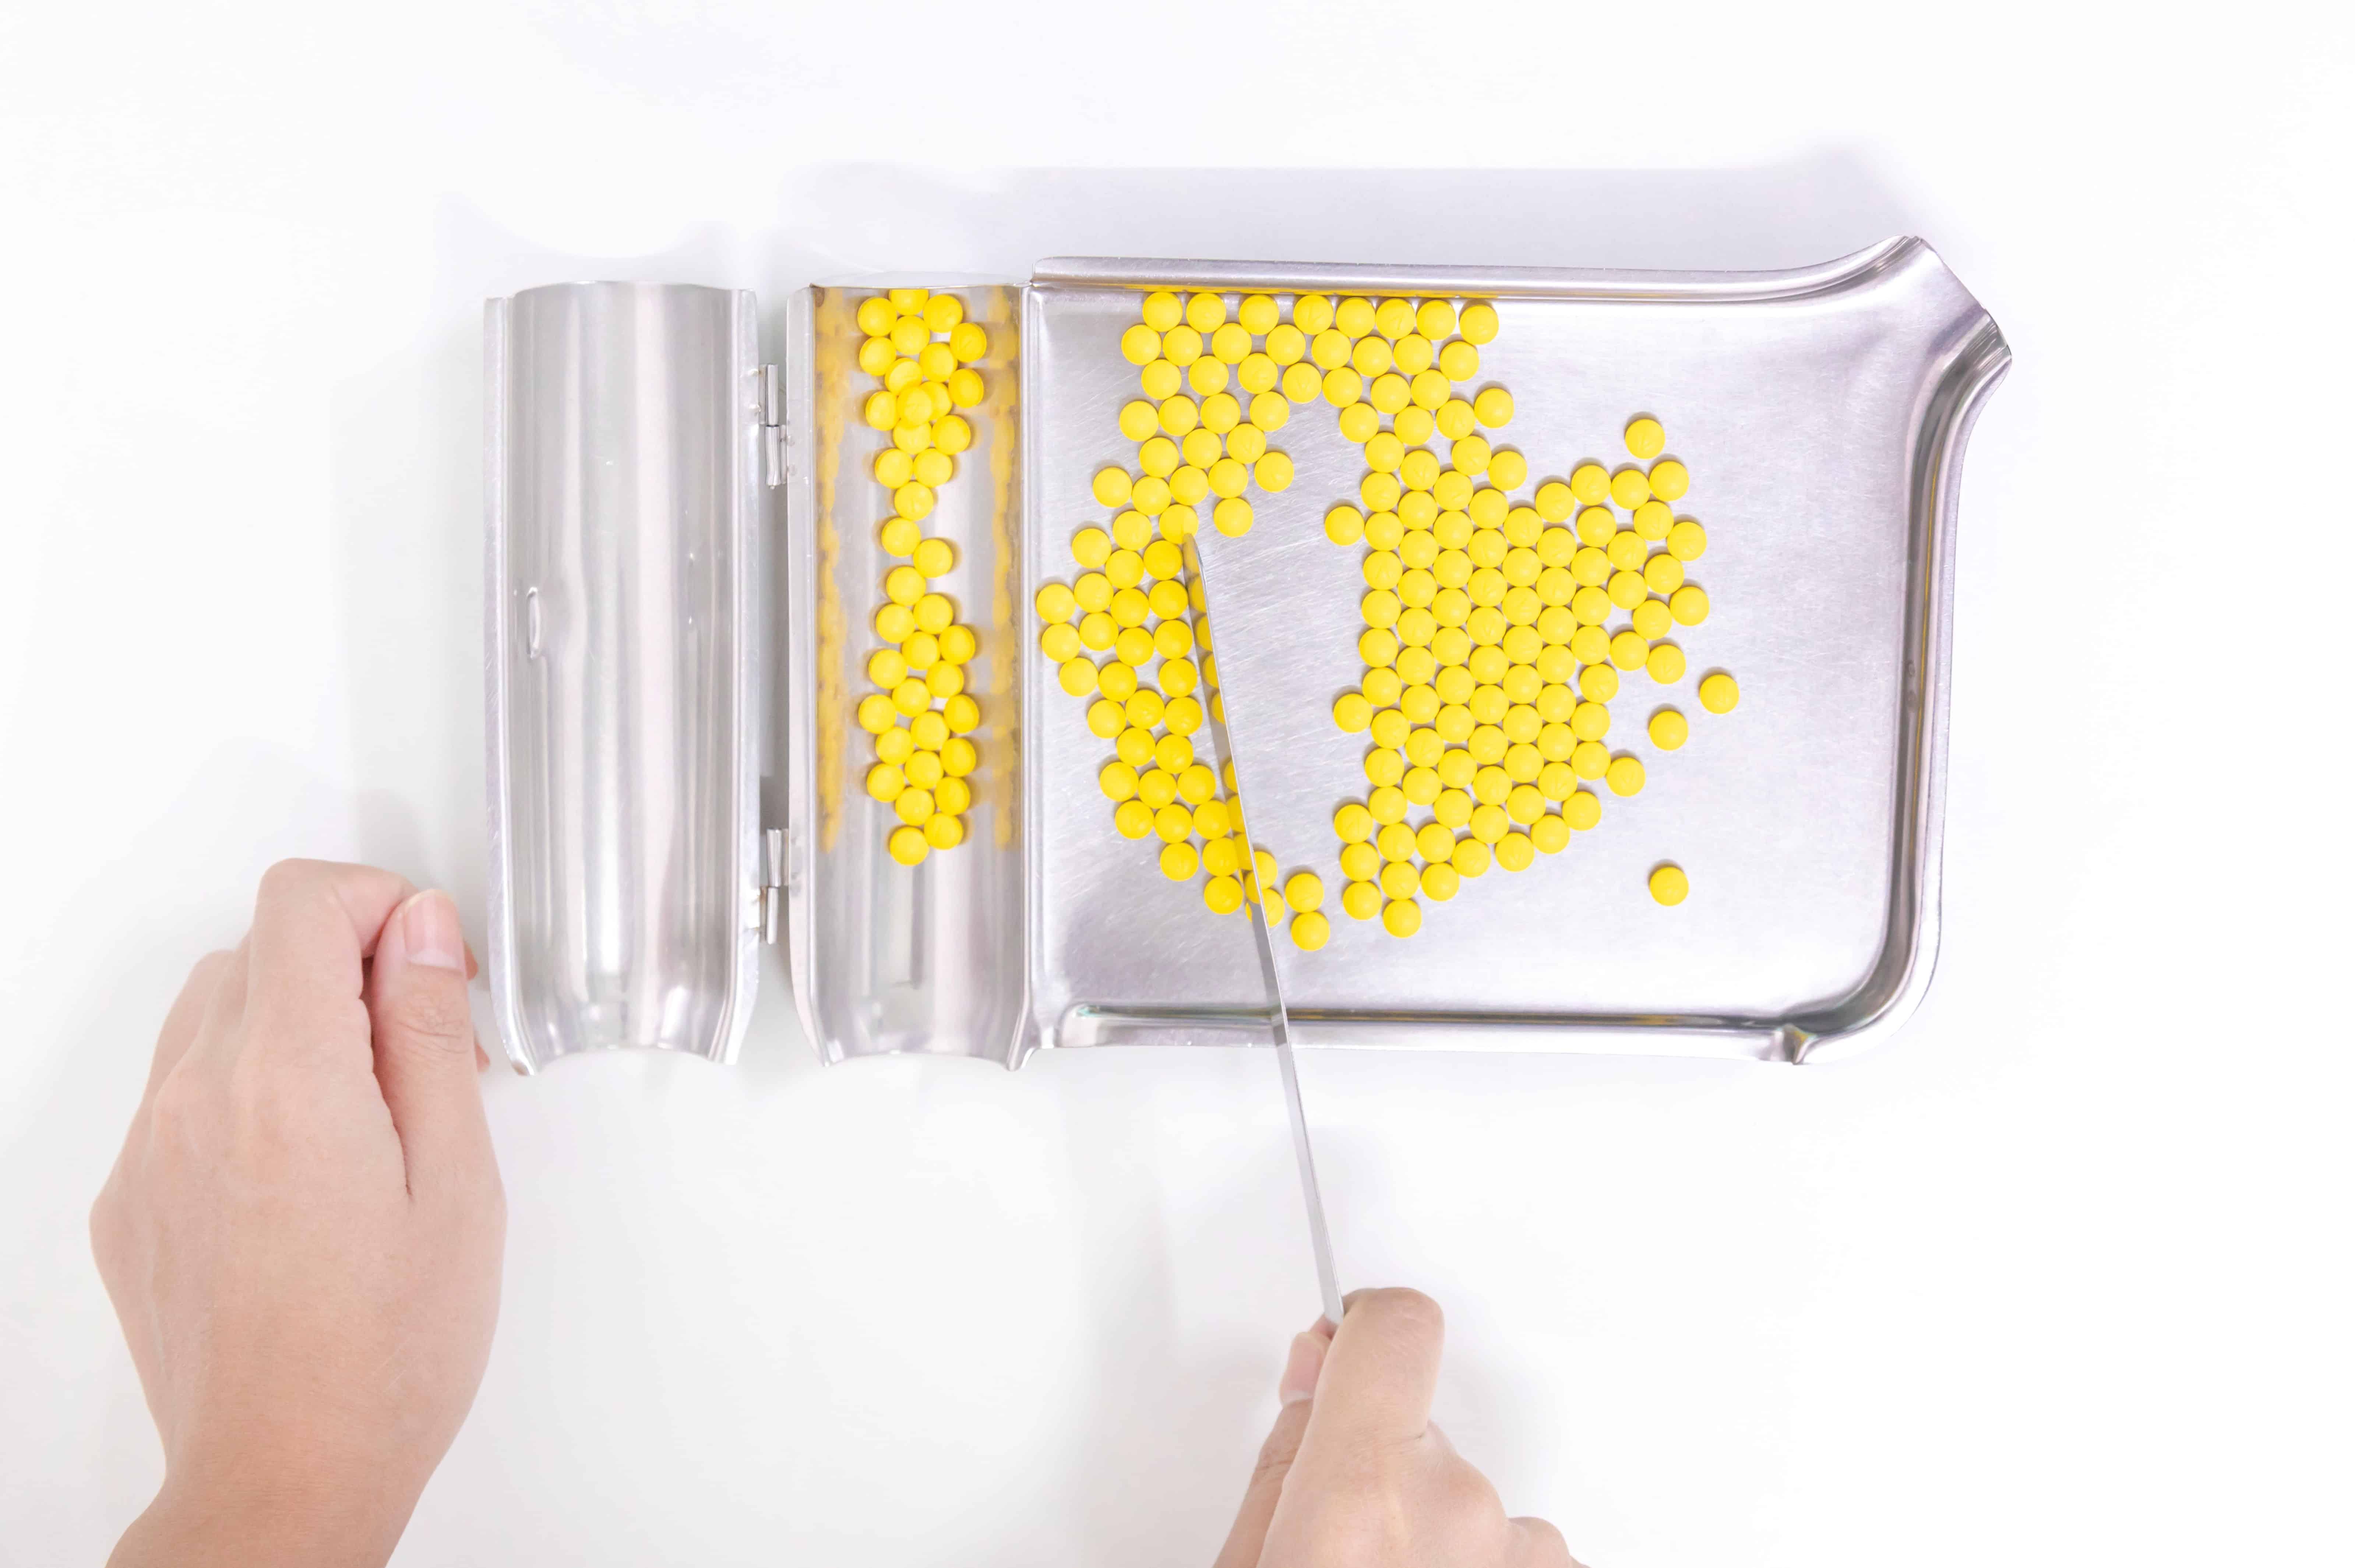 OTC drugs truths revealed